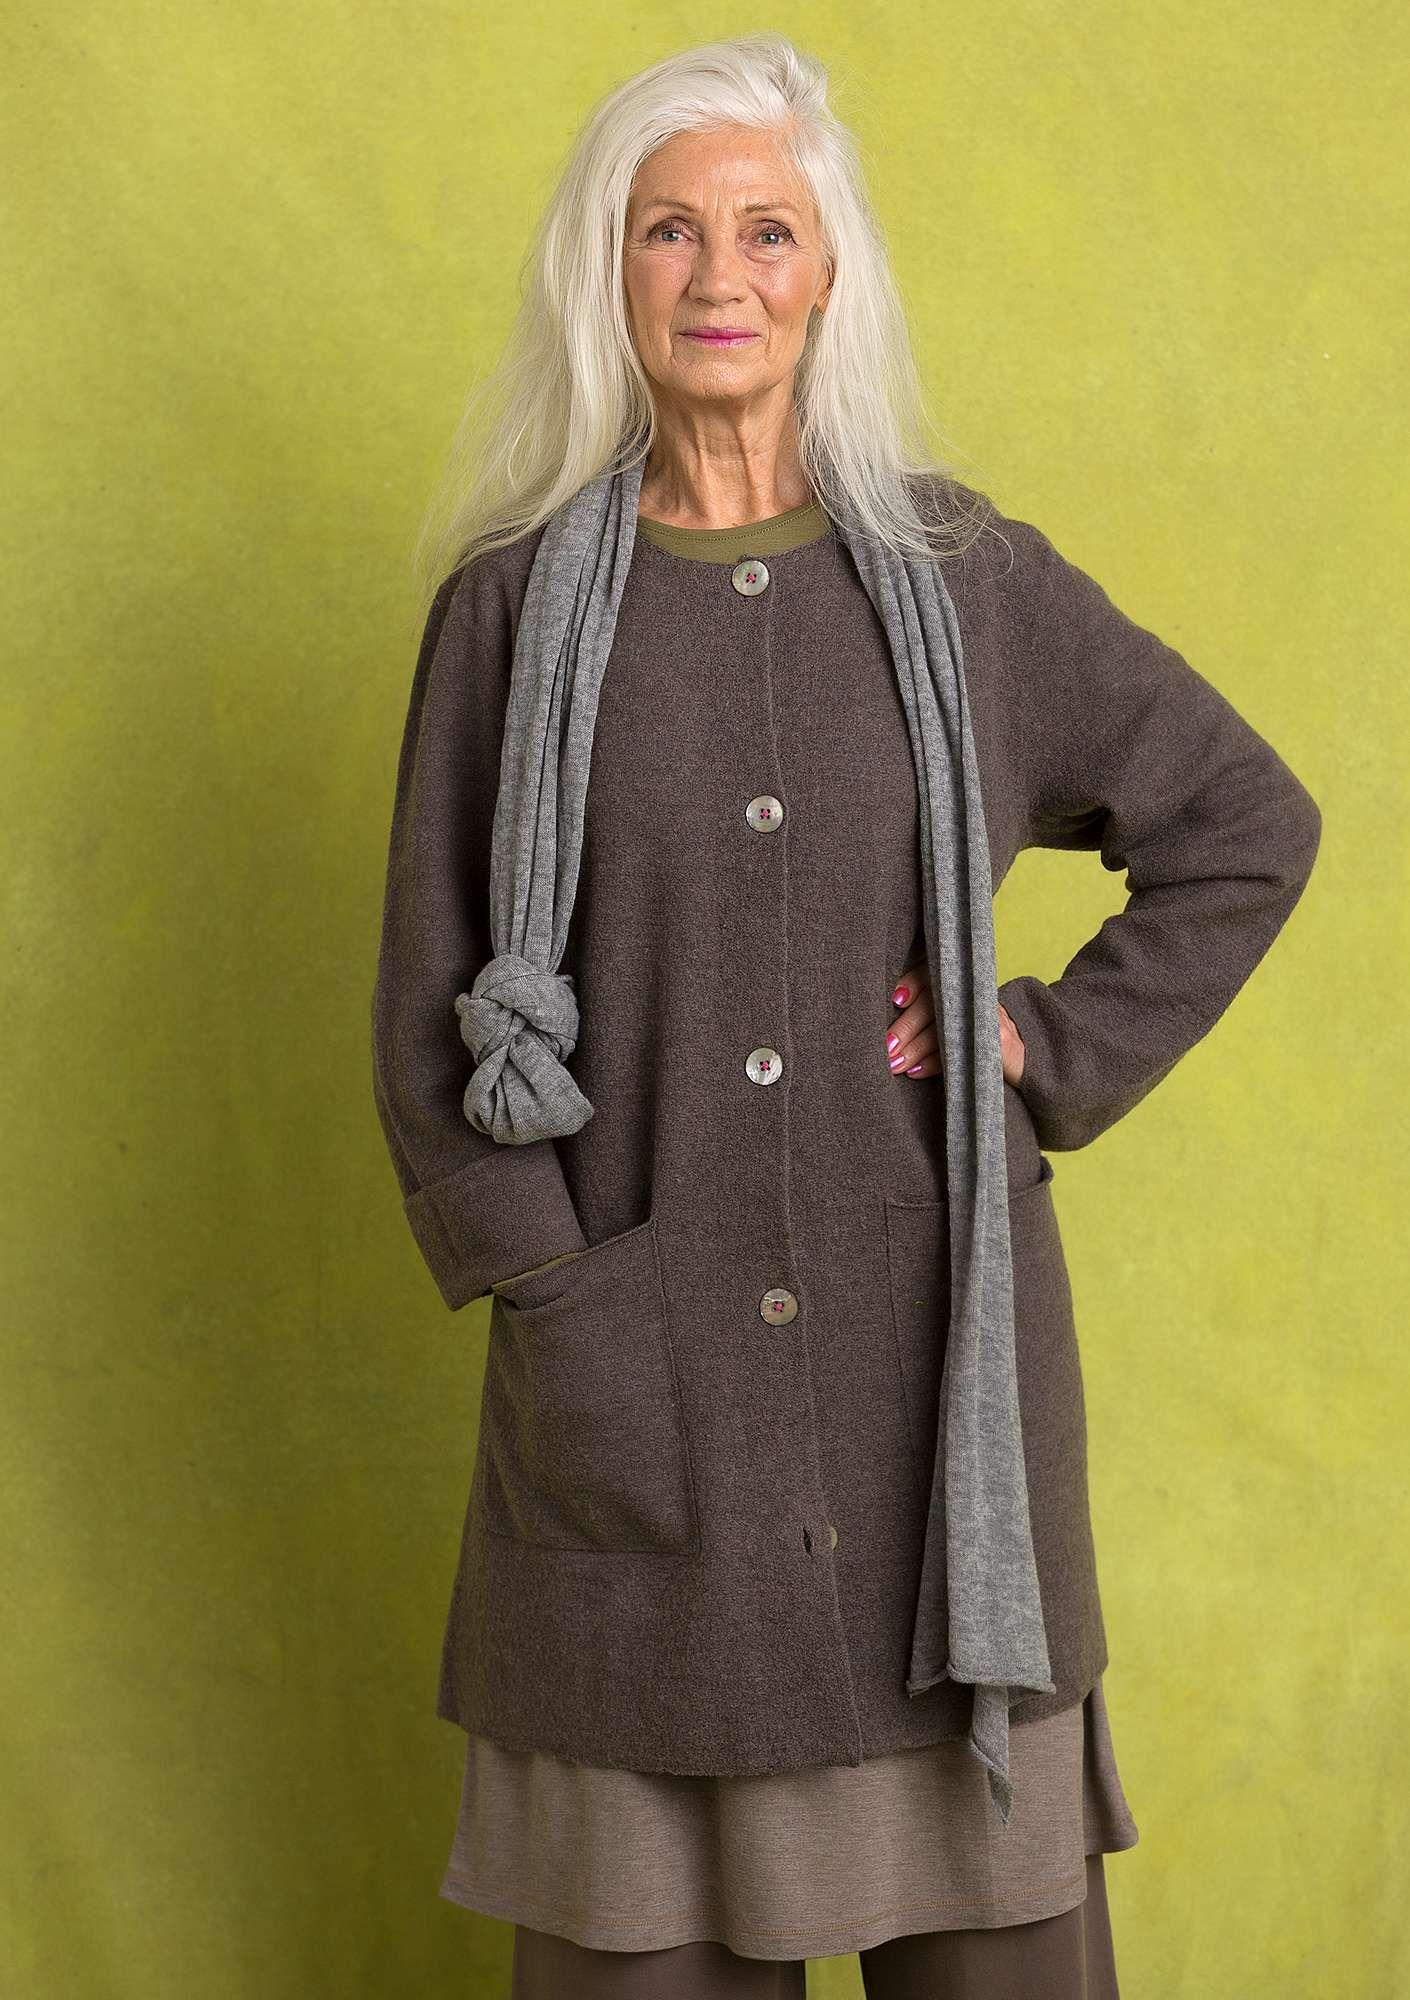 6eb8bccada7a Long cardigan in felted wool | Style Me | Kläder, Hösten 2018, Höst